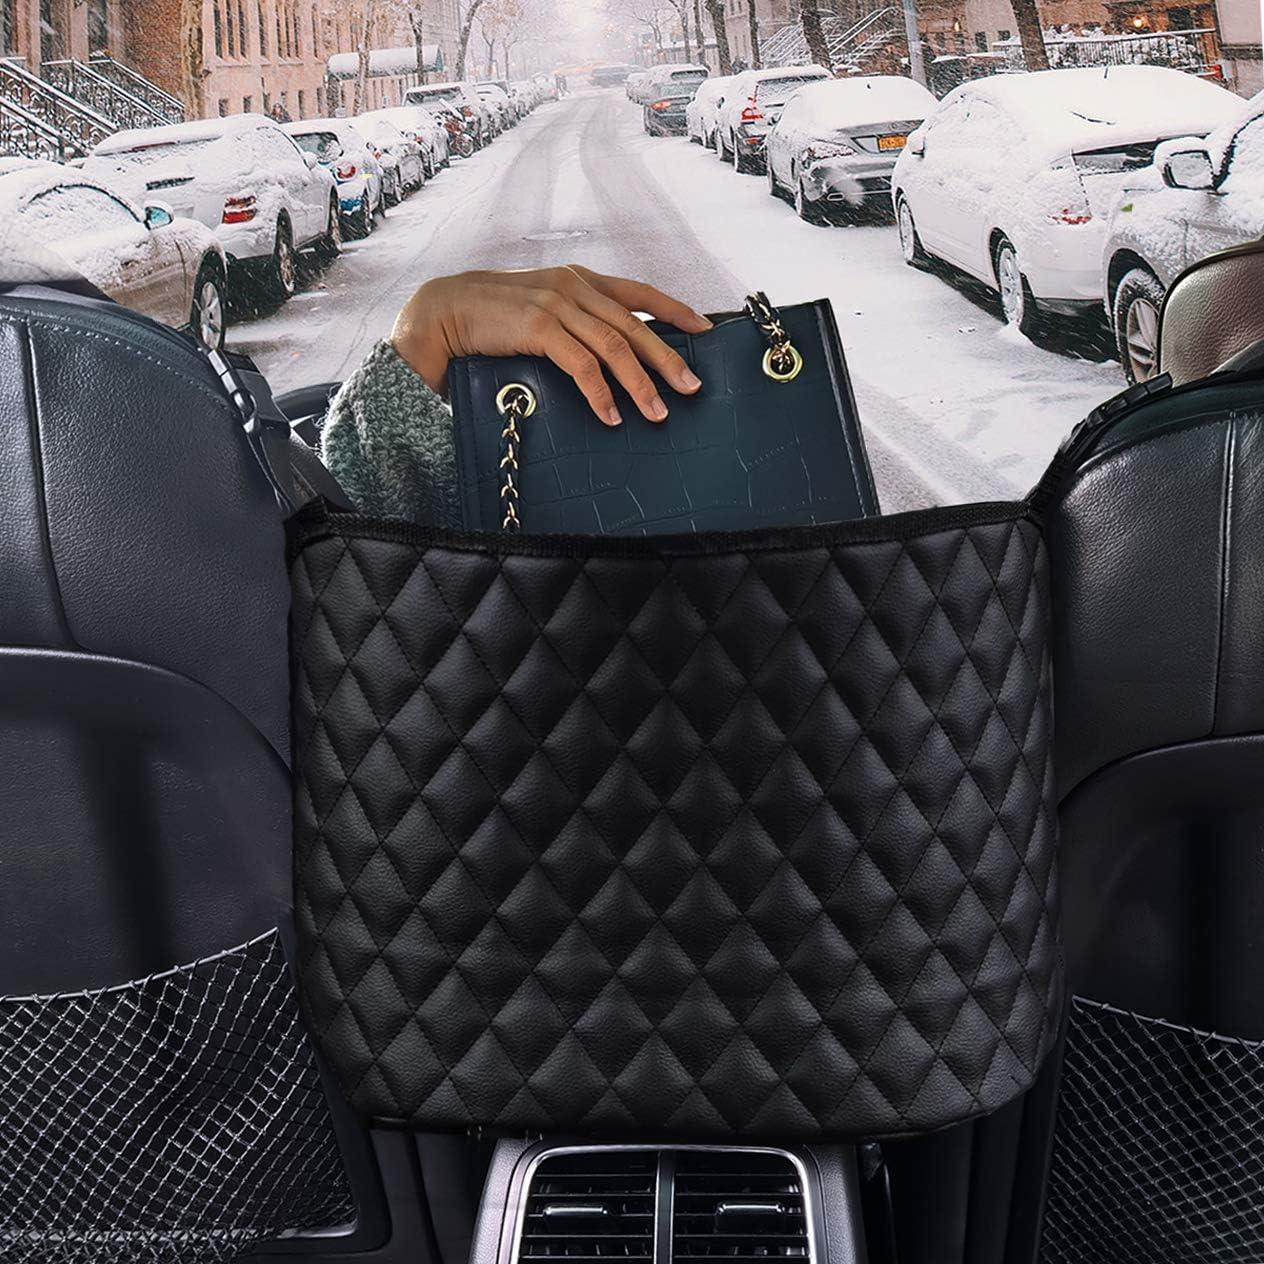 Car Back Seat Organizer, Hipada Car Net Pocket Handbag Holder, Barrier of Backseat Pet Kids, Car Purse Storage and Pocket, Driver Storage Netting Pouch, Car Storage For Purse Phone Documents (Black)